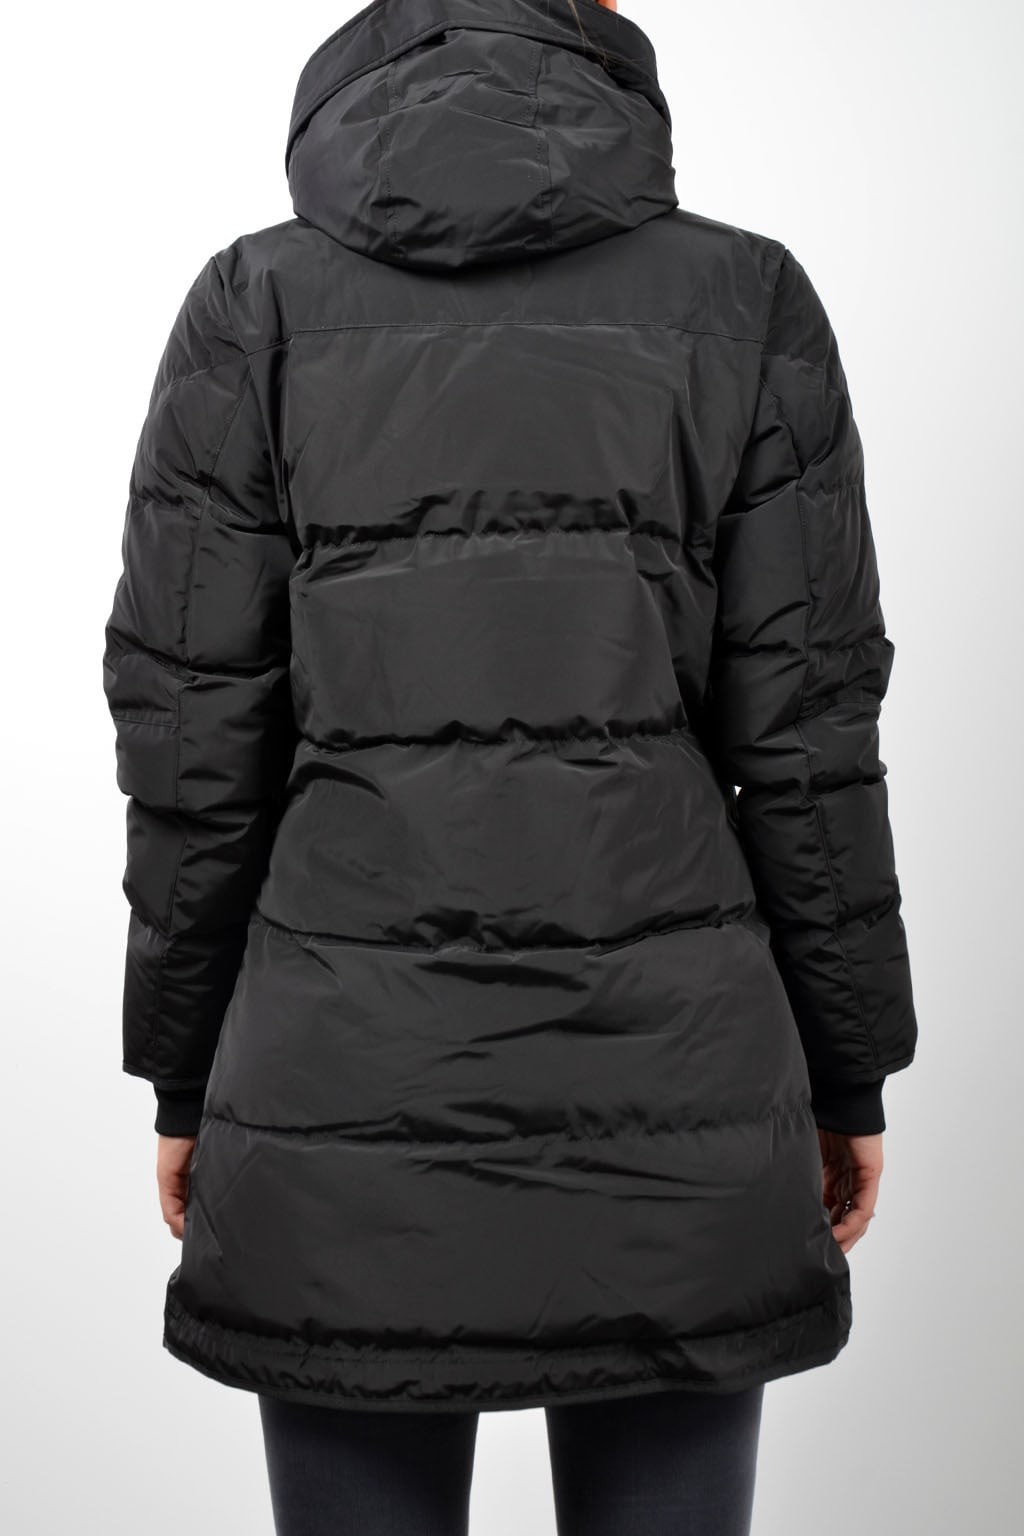 Airforce jade winterjas zwart Xxxl Airforce jade winterjas zwart